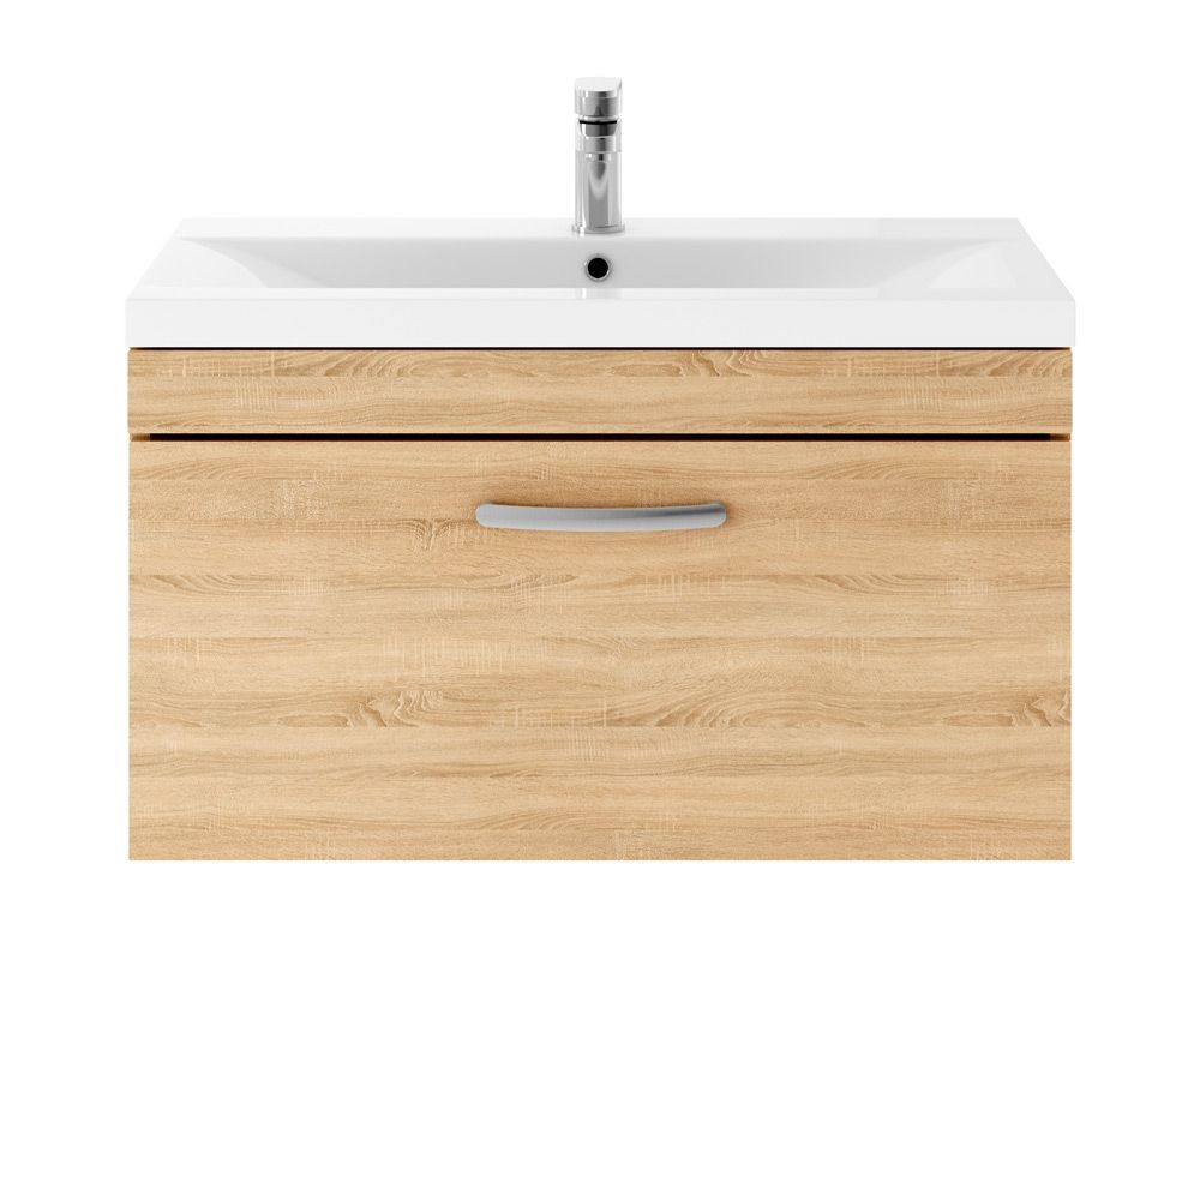 Premier Athena Natural Oak 1 Drawer Wall Hung Vanity Unit 800mm with Mid Edge Basin